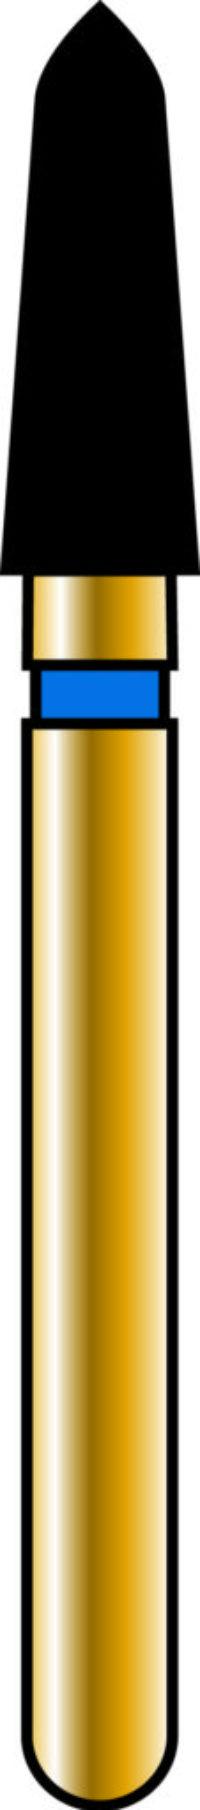 Pointed Taper 21-6mm Gold Diamond Bur - Coarse Grit